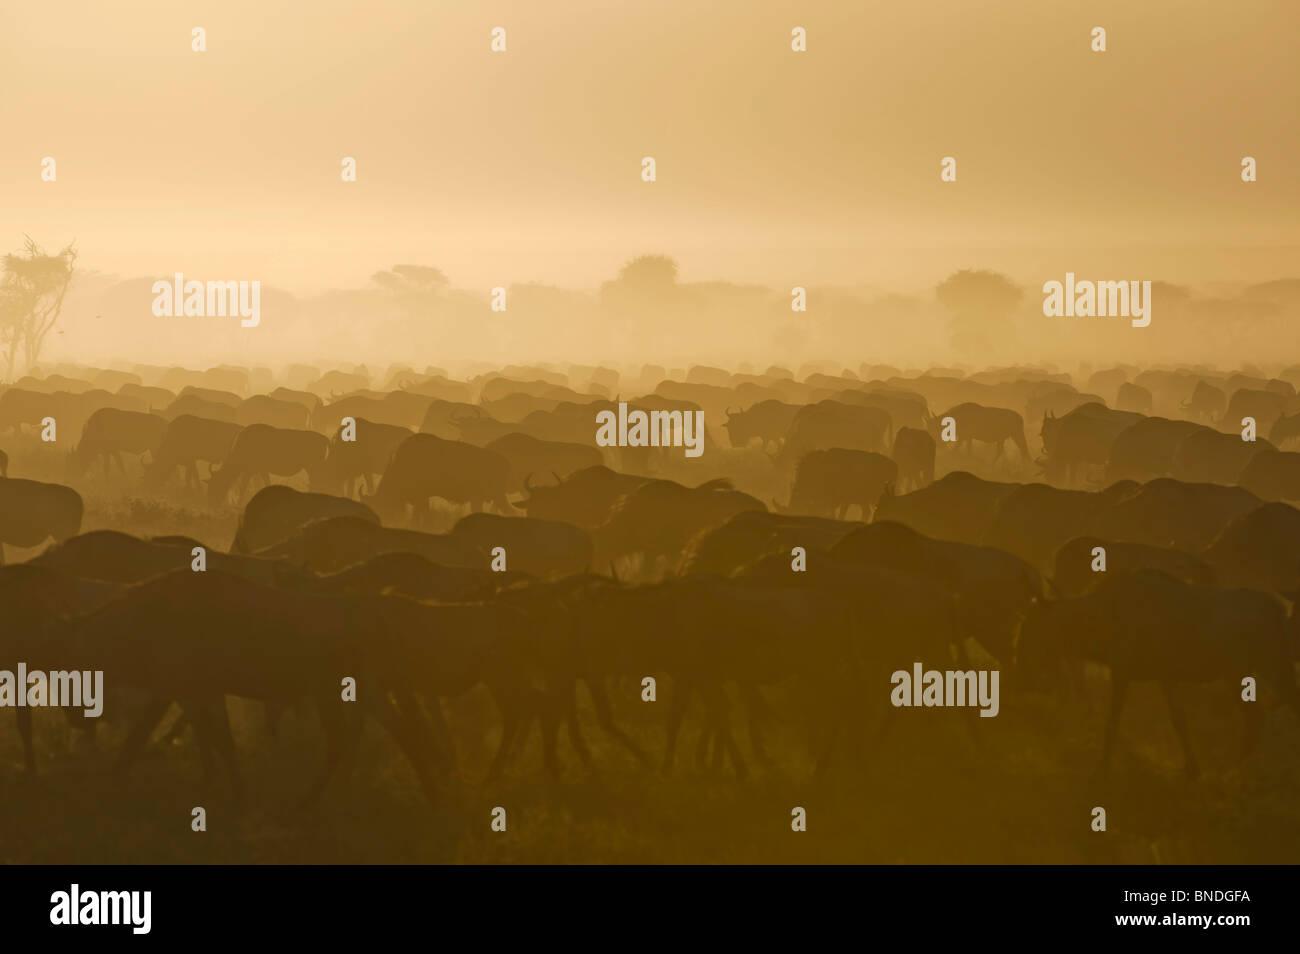 Wildebeest Migration, Serengeti Ecosystem, Tanzania - Stock Image